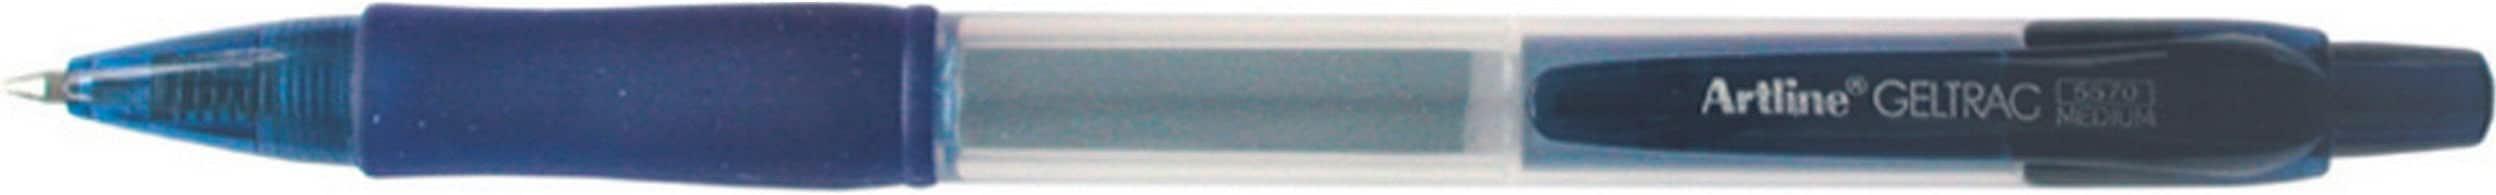 Artline 5570 Geltrac Gel Pen Retractable Medium Blue